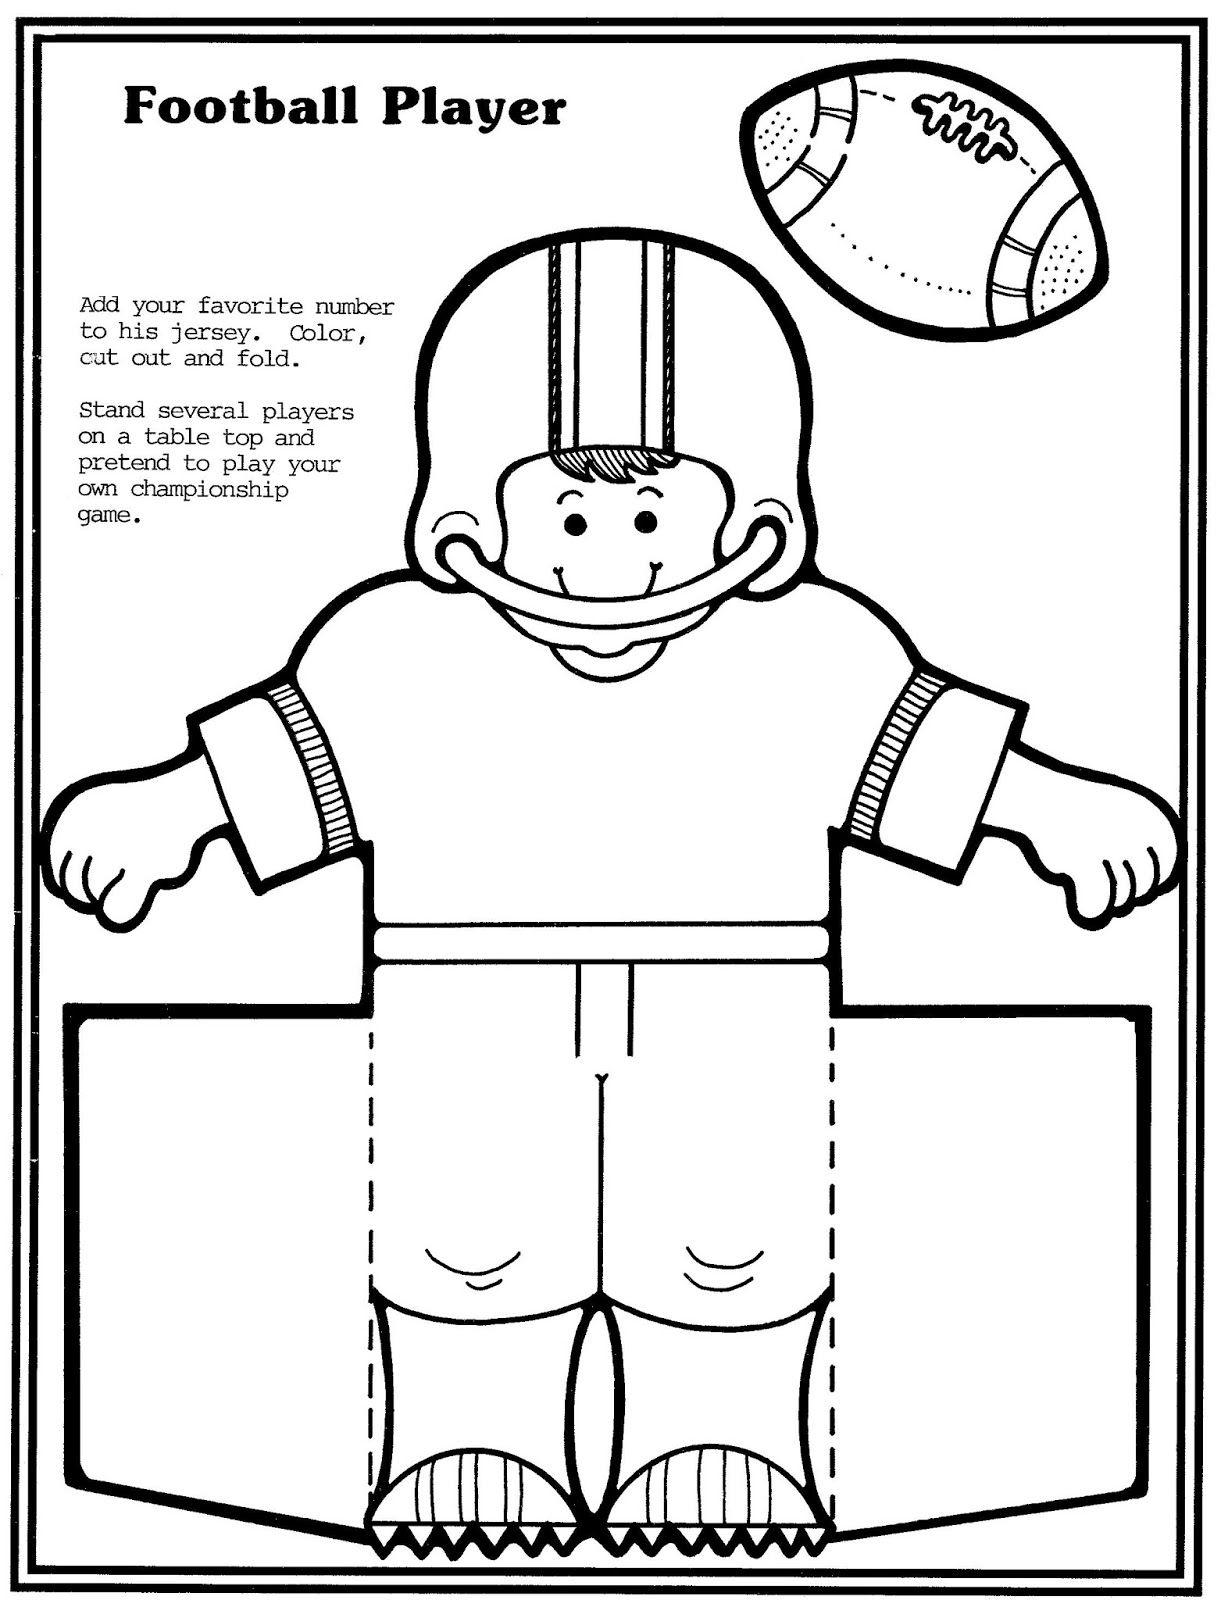 1990 Have fun Super Bowl Sunday